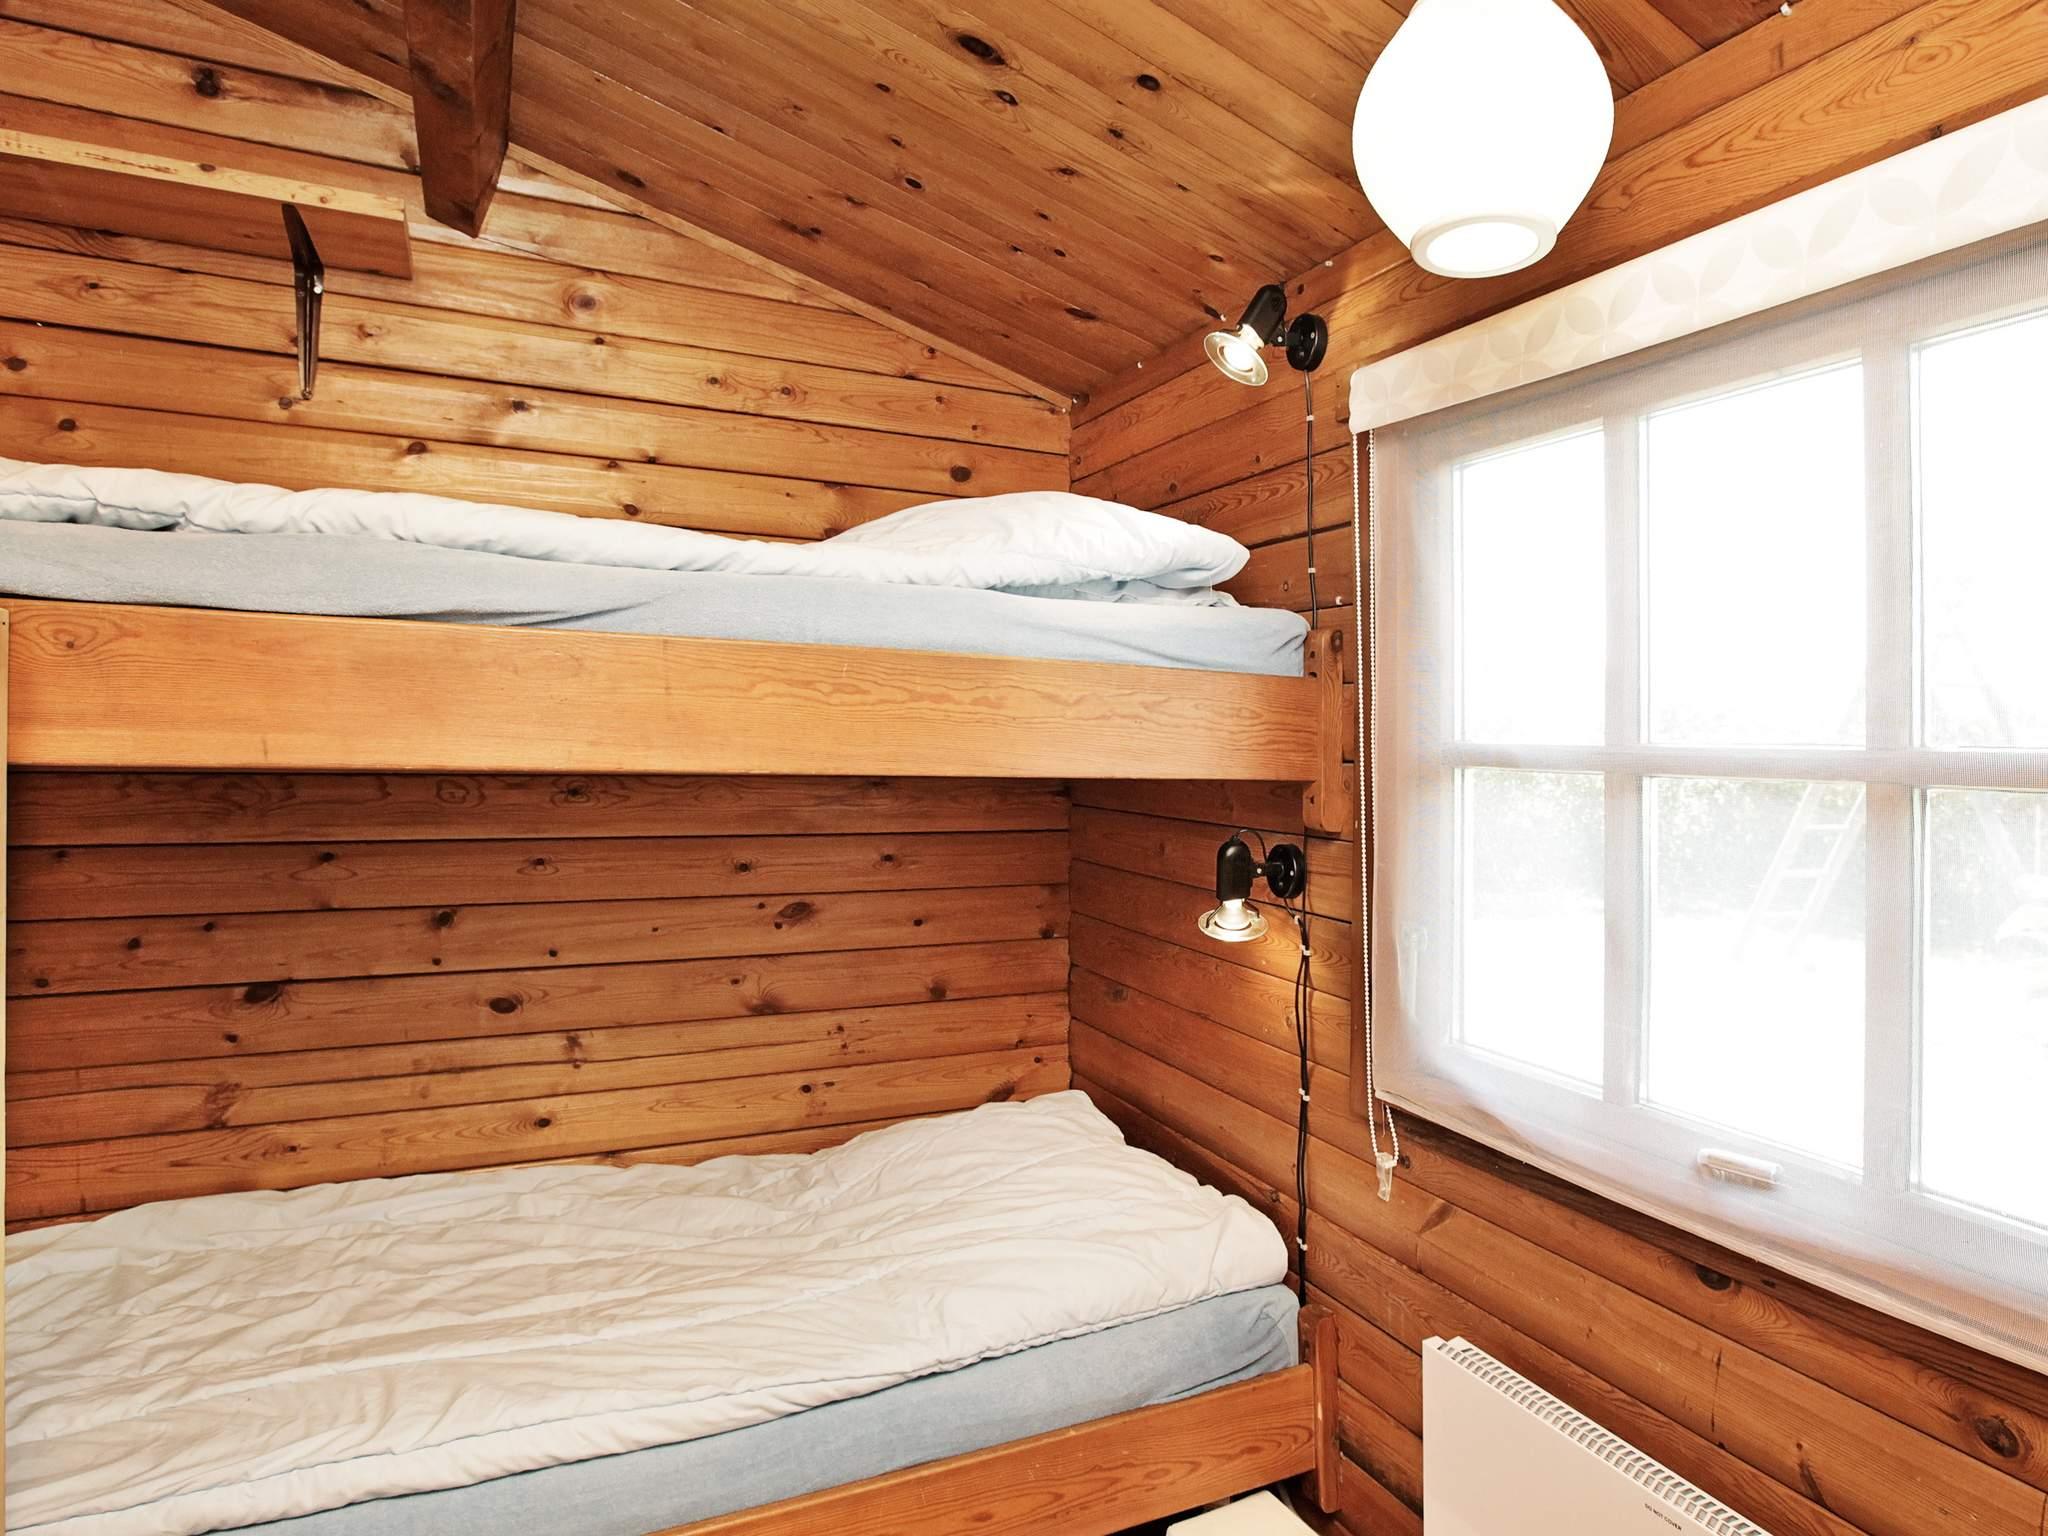 Maison de vacances Hesseløje/Fruerlund (87495), Faaborg, , Fionie, Danemark, image 12